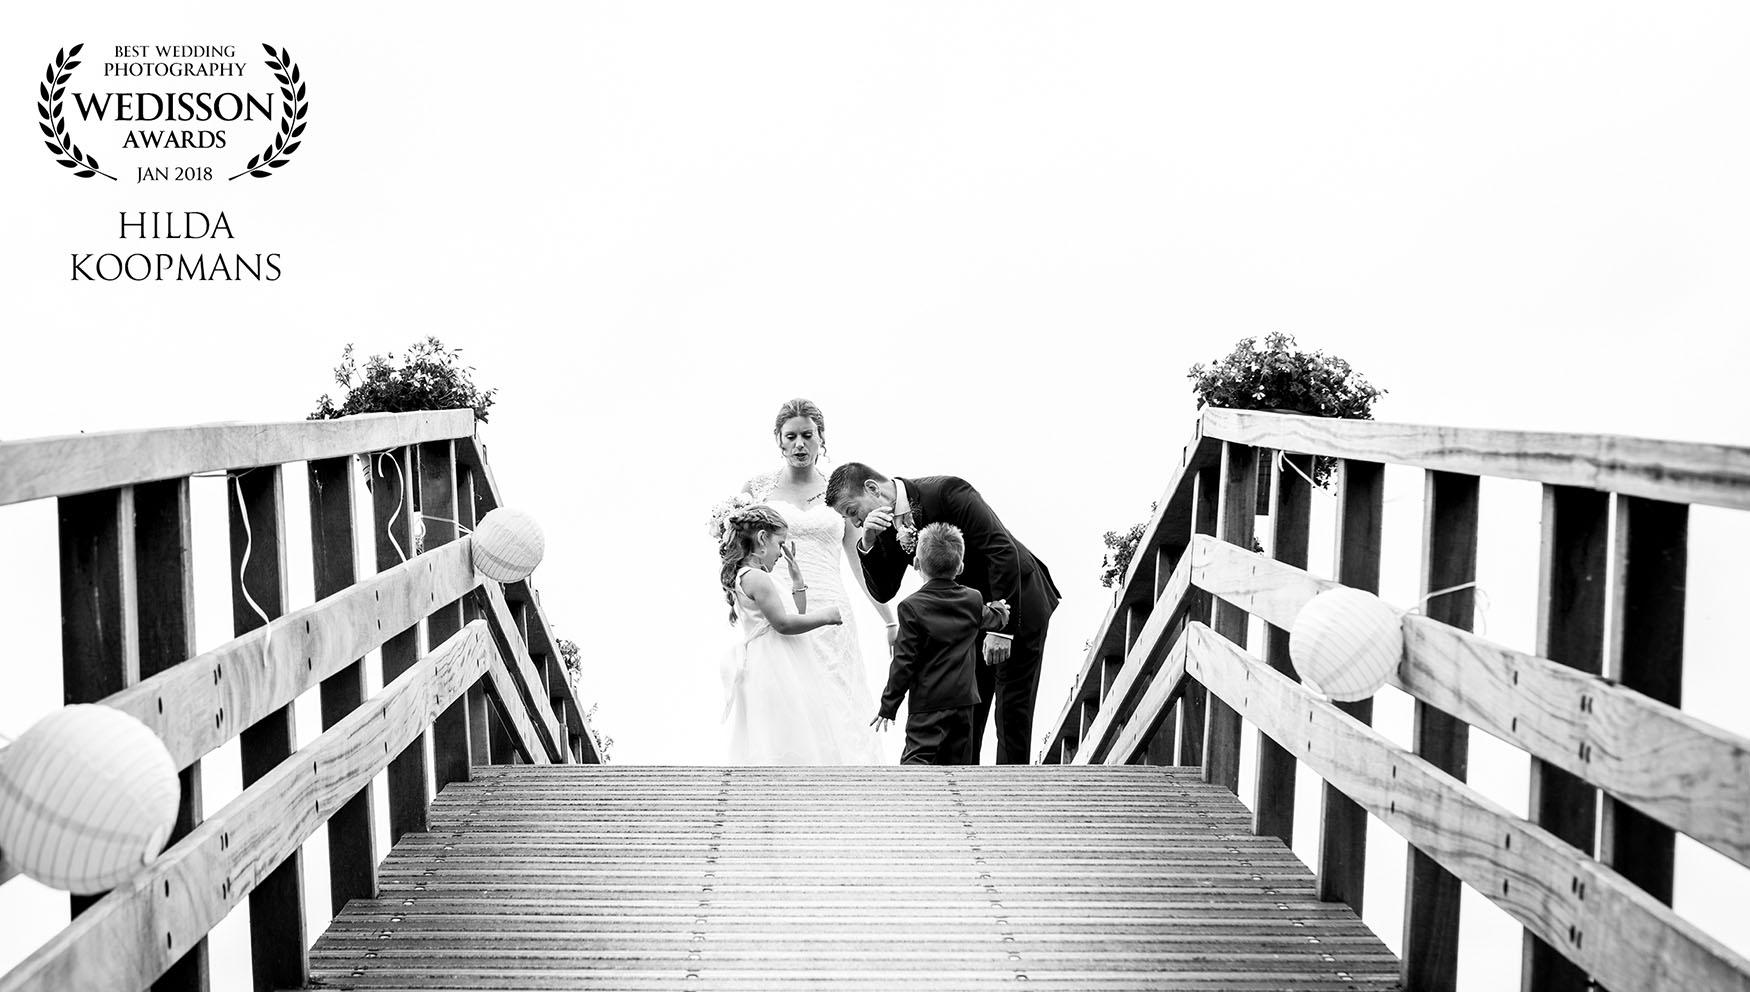 trouwfotograaf award bruidsfotograaf drenthe groningen friesland emoties puur